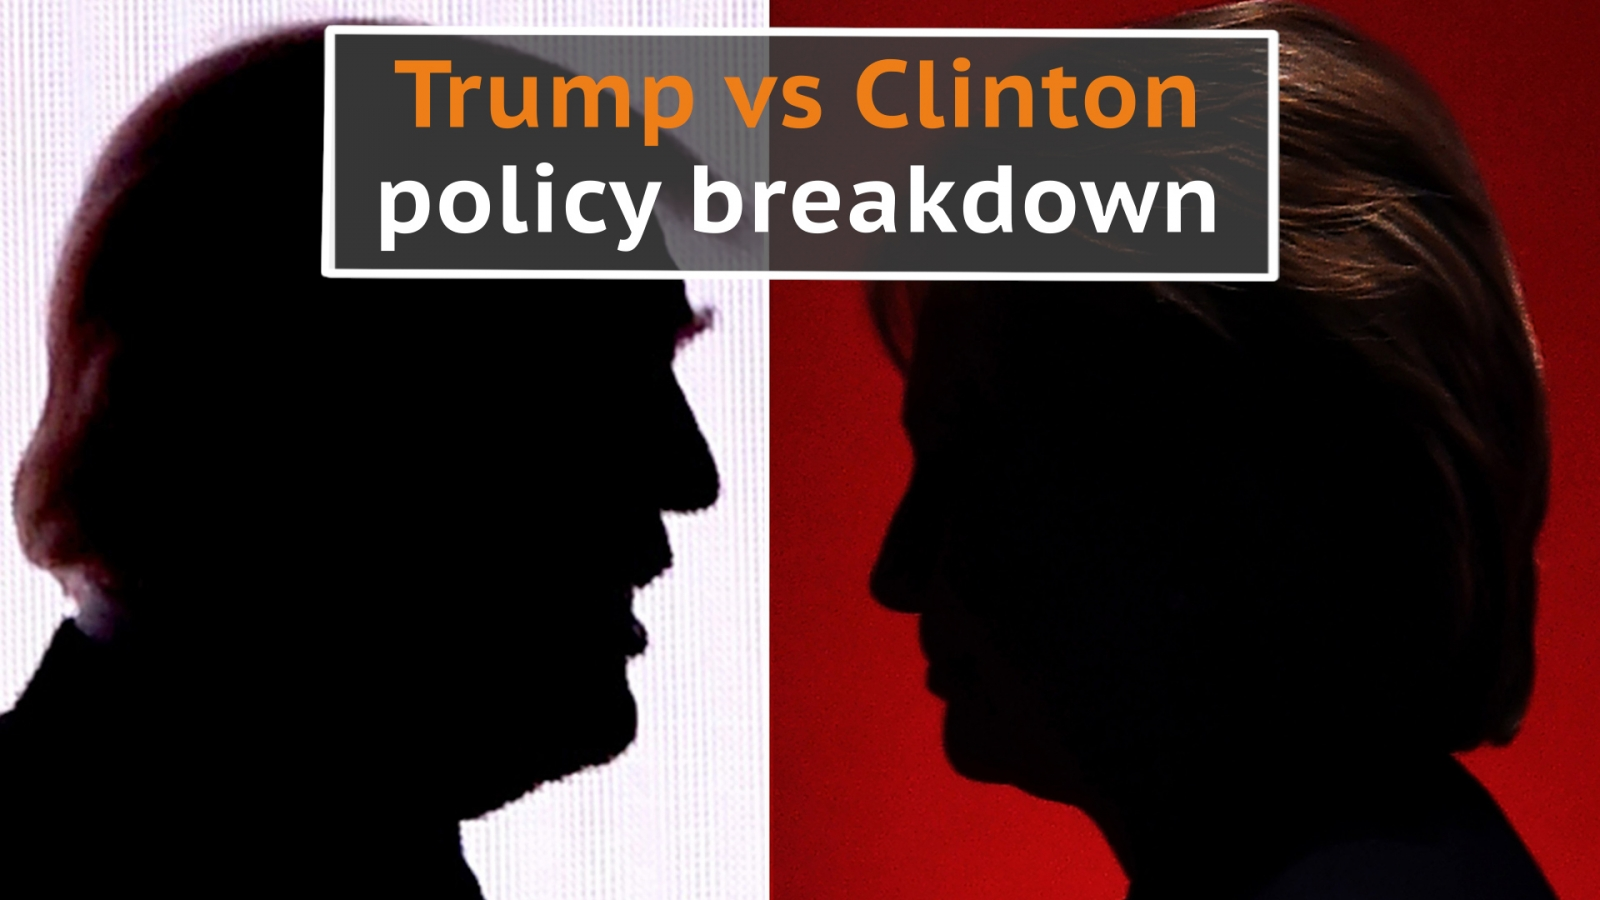 Trump vs Clinton policy breakdown